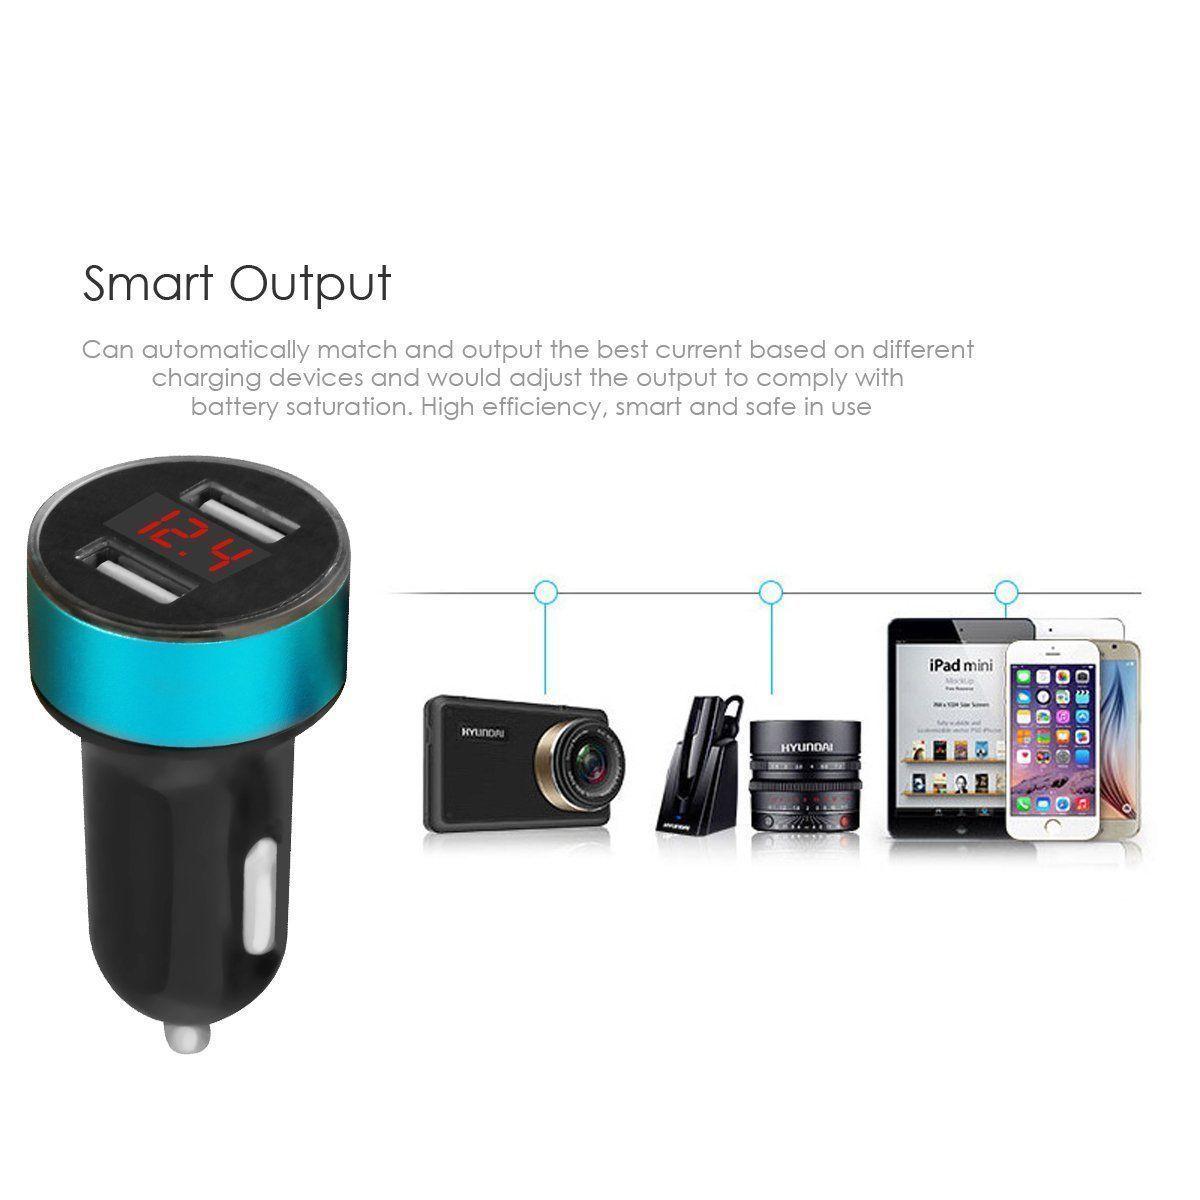 Cargador de coche 5V / 3.1A Carga rápida Puerto USB dual Adaptador para encendedor de cigarrillos Voltaje Envío gratis